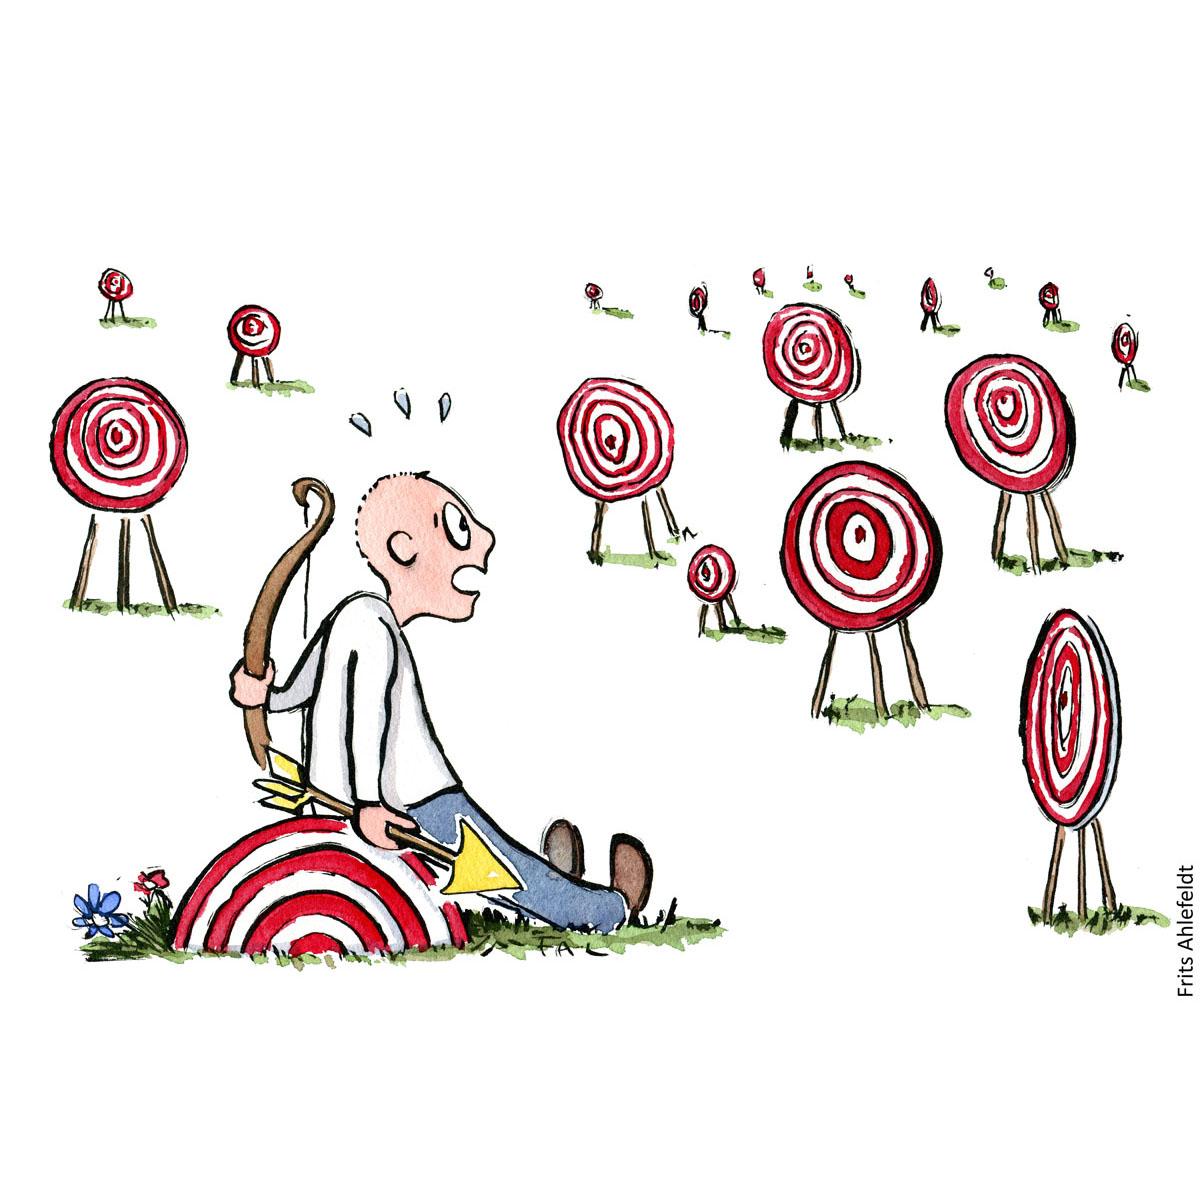 Illustration of man sitting on target circle, looking at bullseye target symbols all around him. Psychology drawing by Frits Ahlefeldt